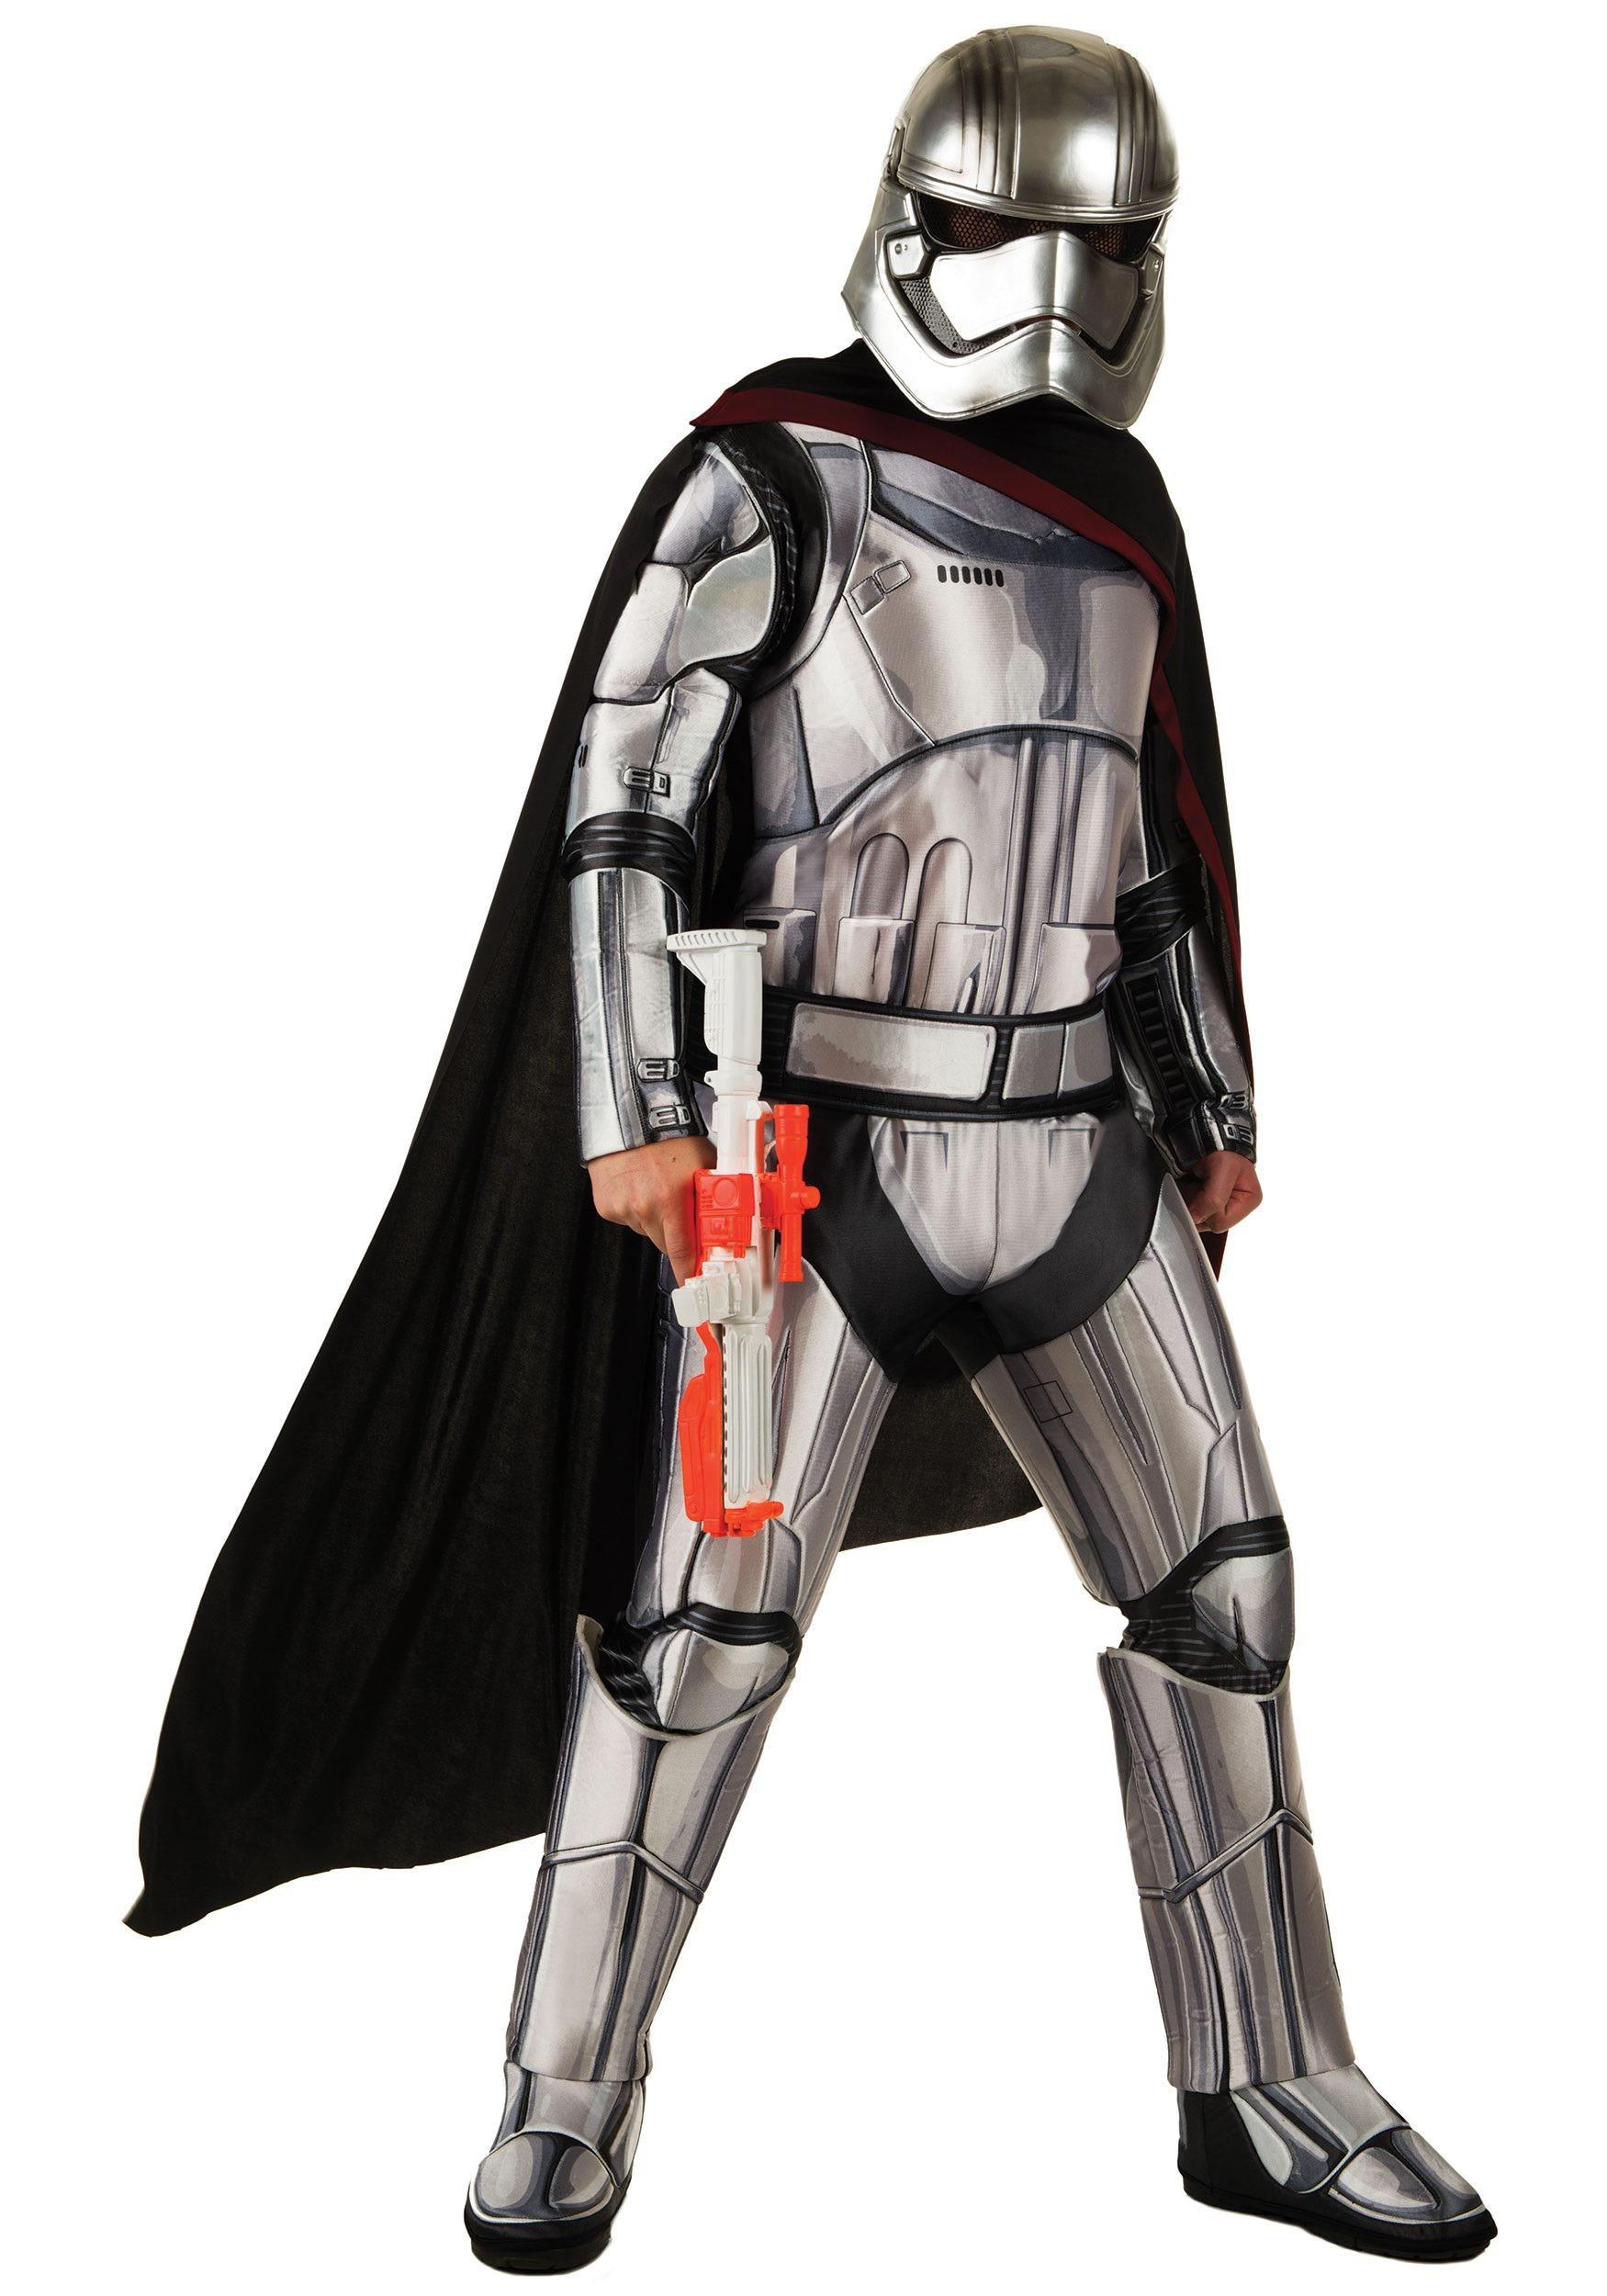 Deluxe Star Wars The Force Awakens Captain Phasma Costume RU810670